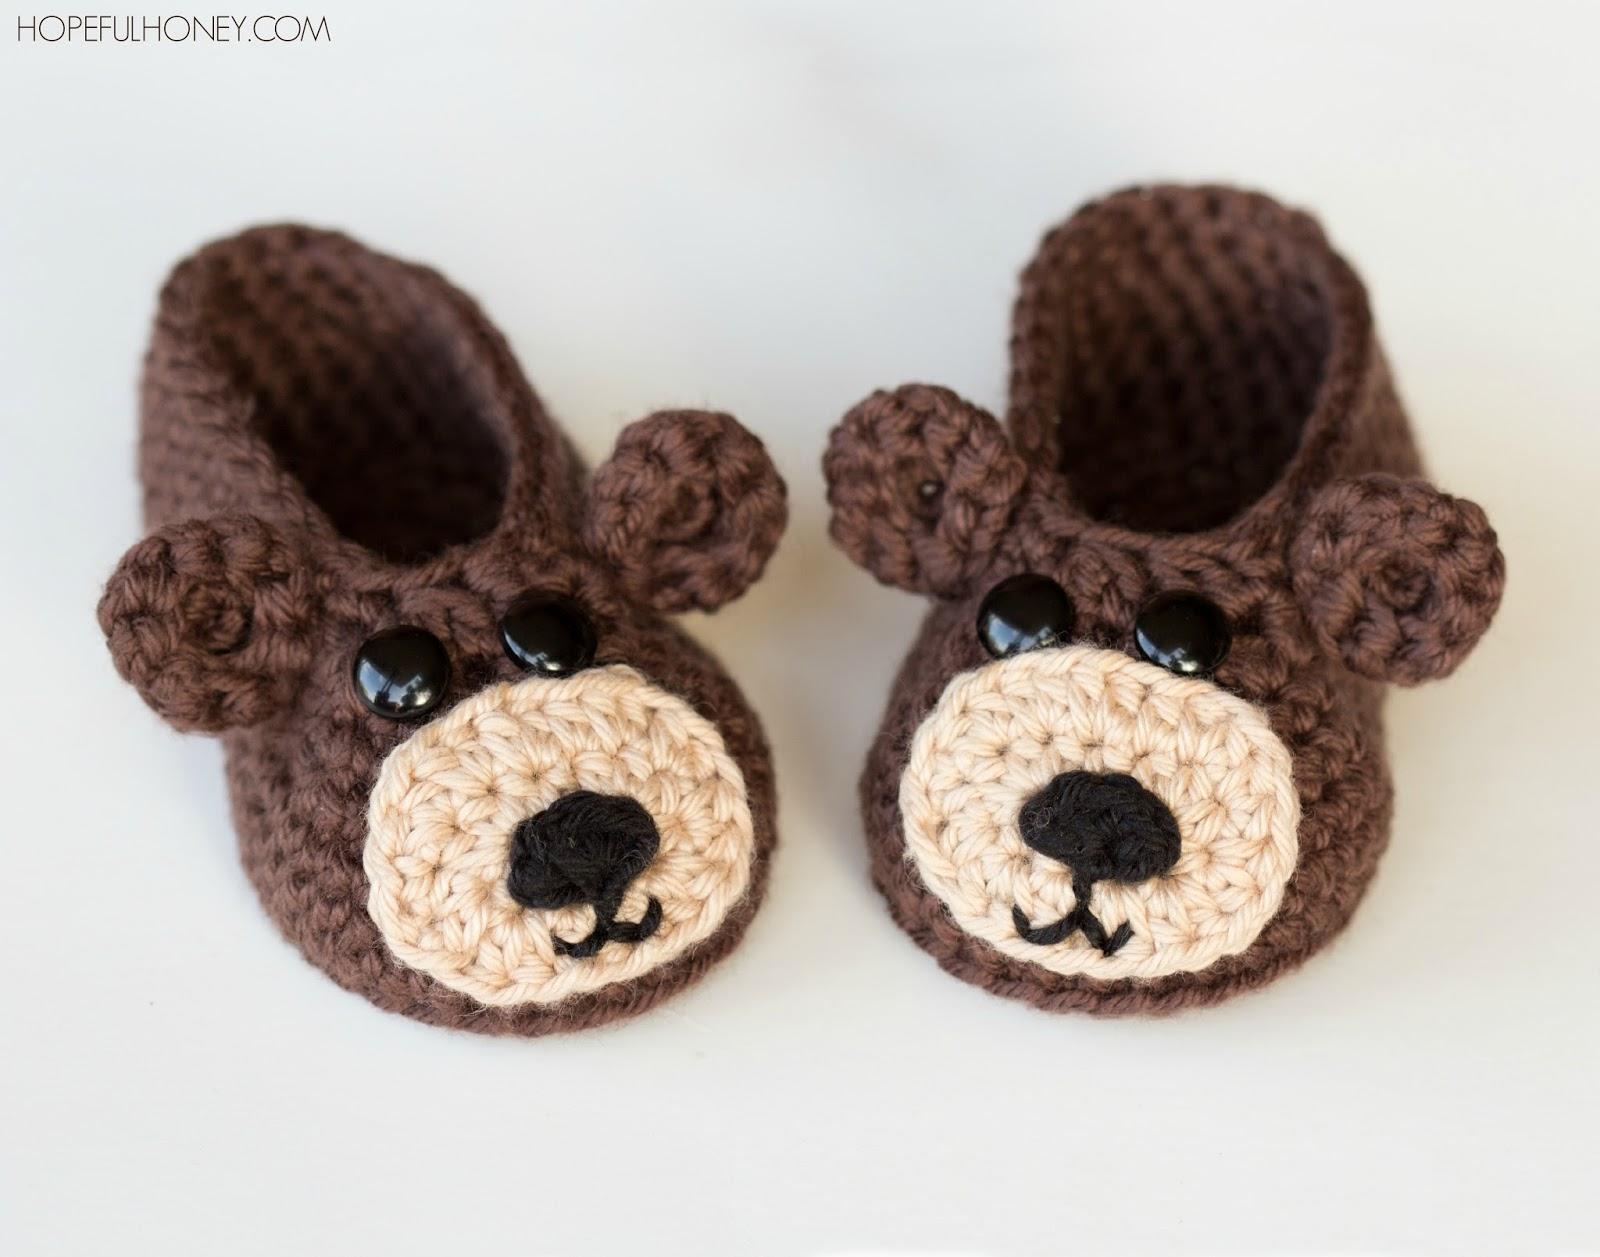 Crochet Baby Bear Booties Pattern : Hopeful Honey Craft, Crochet, Create: Teddy Bear Baby ...